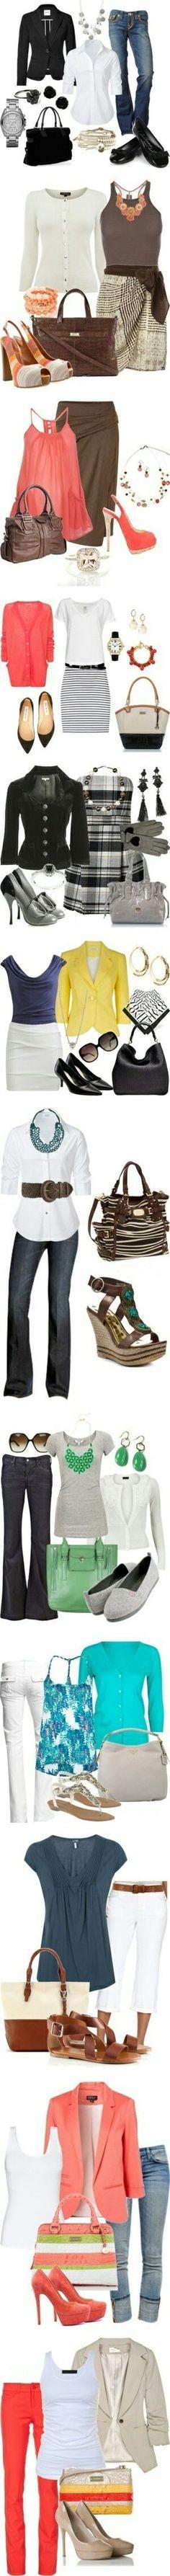 LOLO Moda: See more styles on: www.lolomoda.com